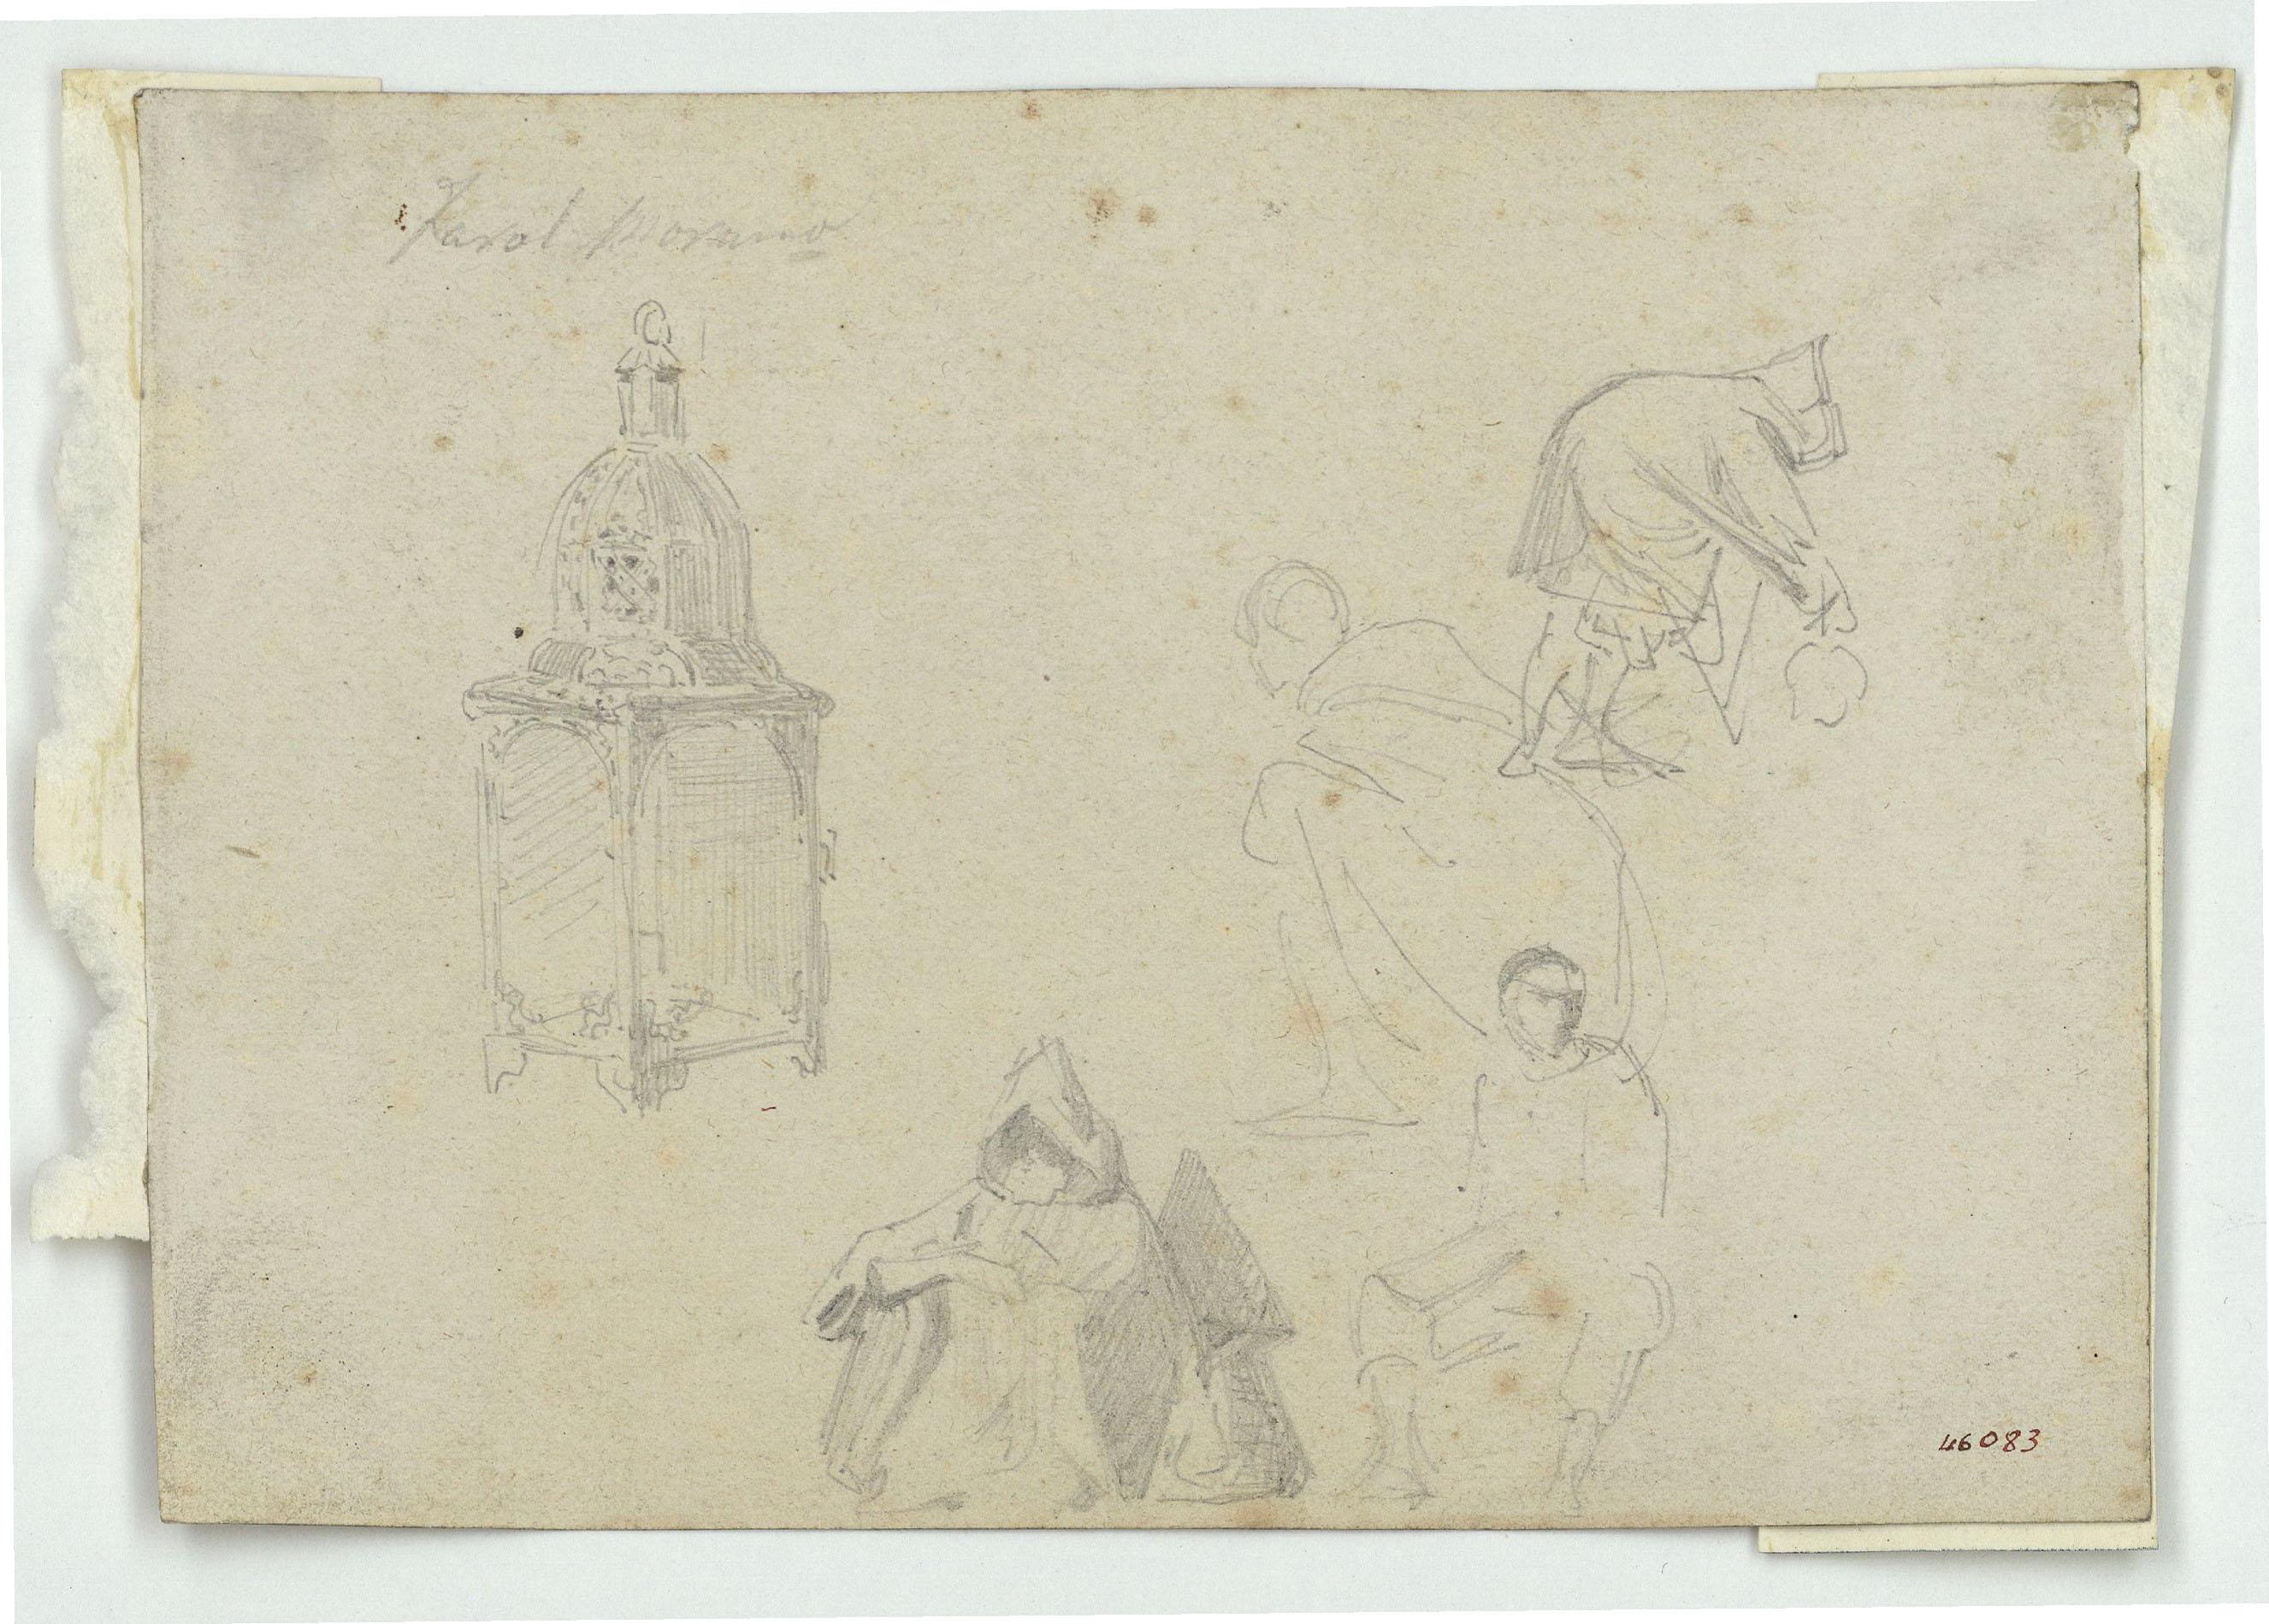 Marià Fortuny - Fanal d'estil musulmà i marroquins (anvers) / Croquis inconcret (revers) - Cap a 1860-1862